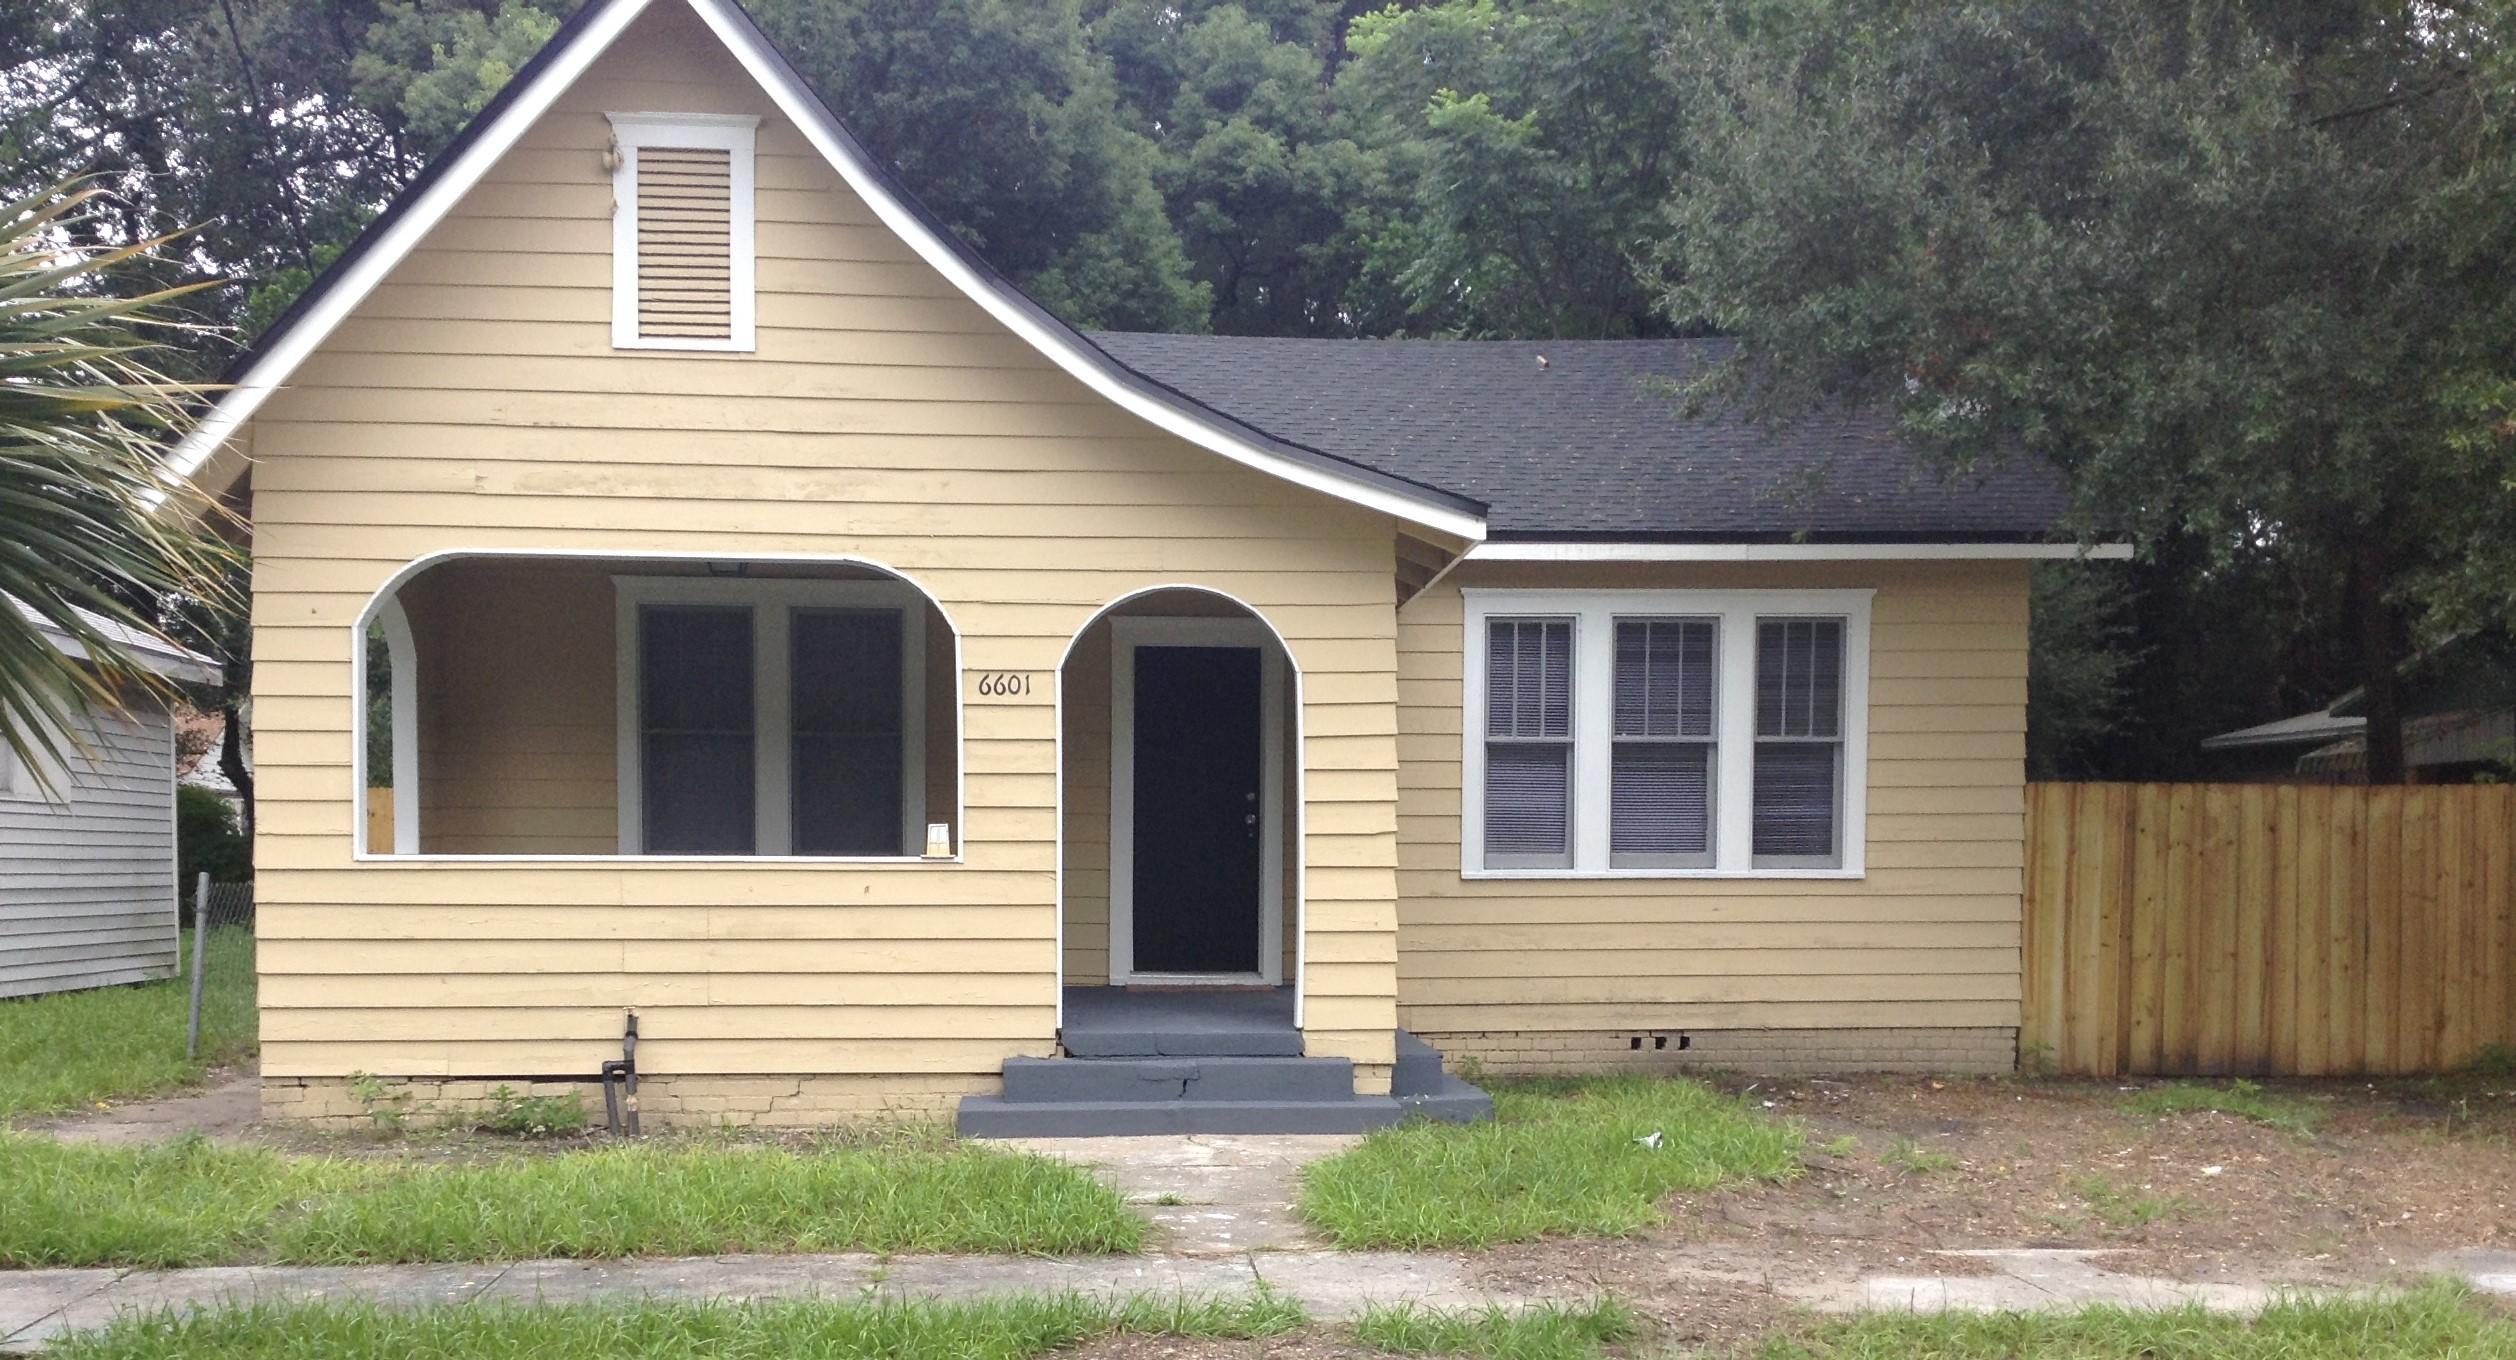 6601 Sunset Dr Jacksonville Fl 32208 3 Bedroom Apartment For Rent For 850 Month Zumper